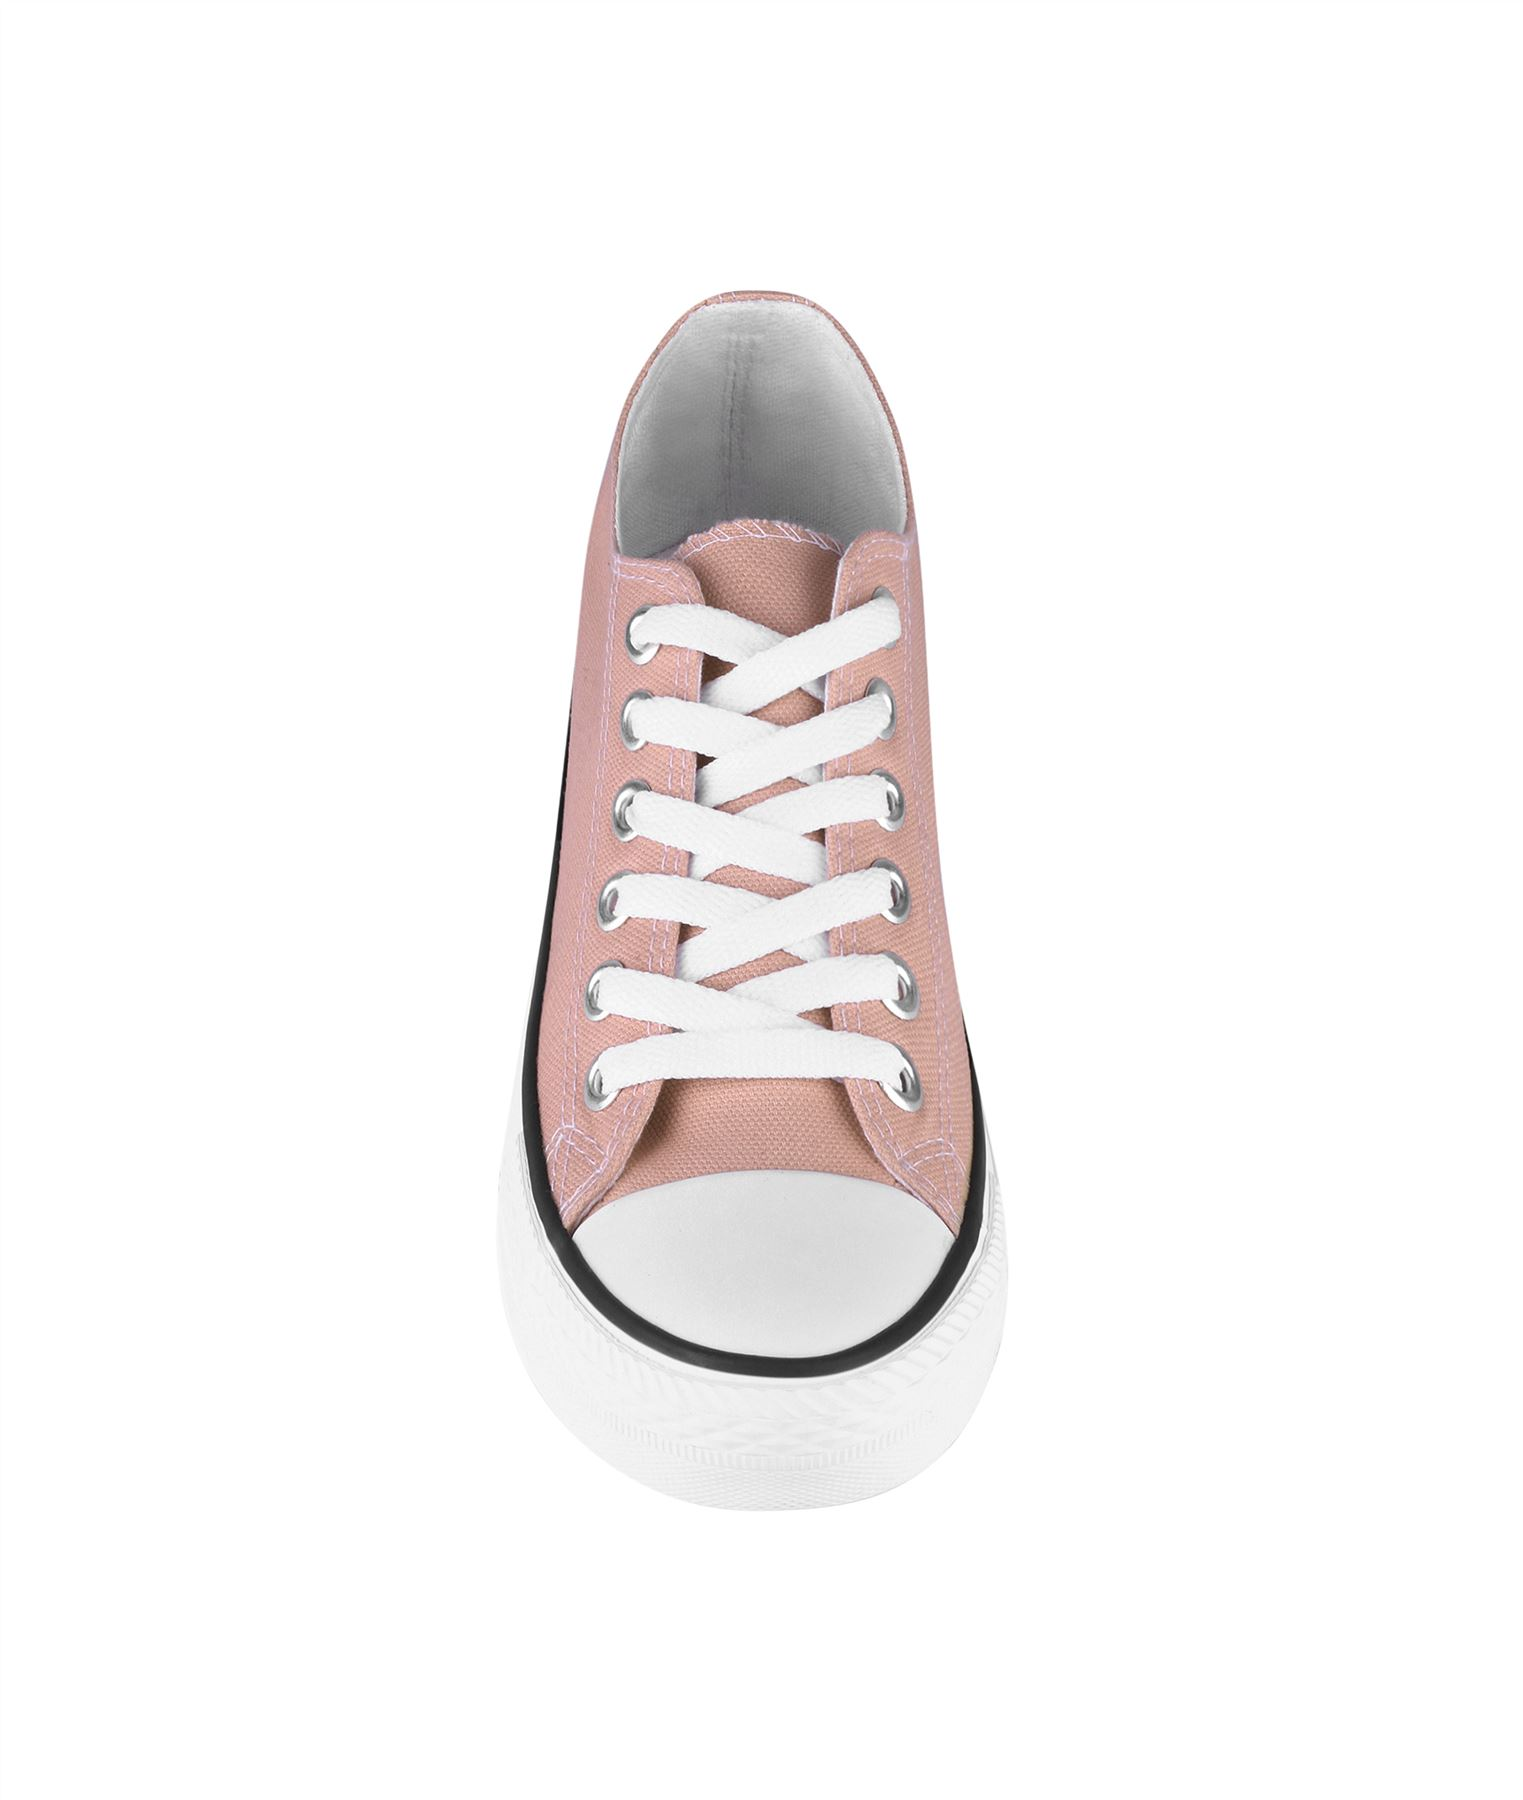 Zapatillas-Mujer-Casuales-Deportiva-Barata-Lona-Moda-Originales-Outlet-Tela-Moda miniatura 43